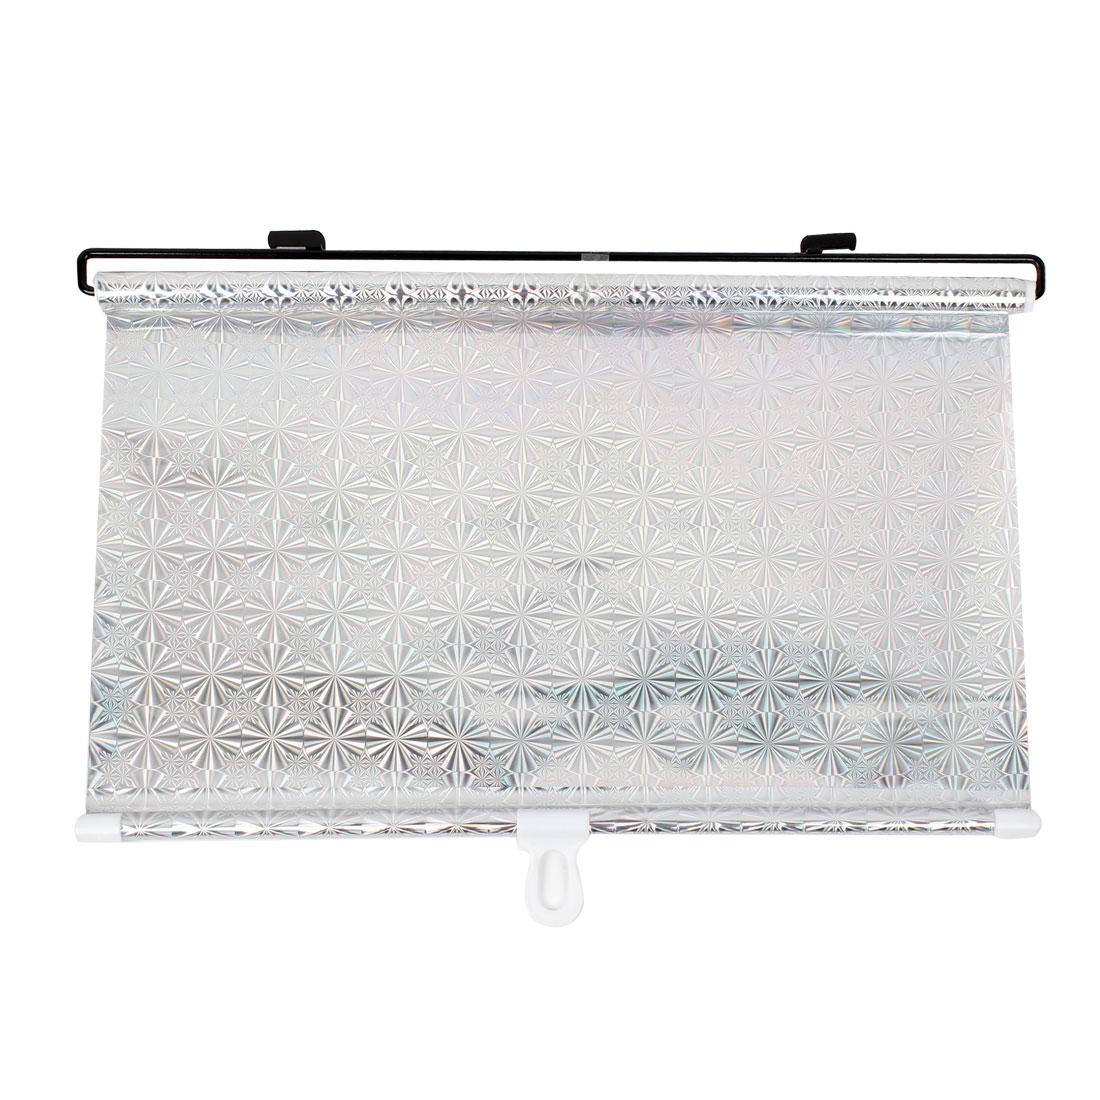 Auto Car Retractable Roll Blind Side Window Sun Shade Silver Tone 40cm x 60cm